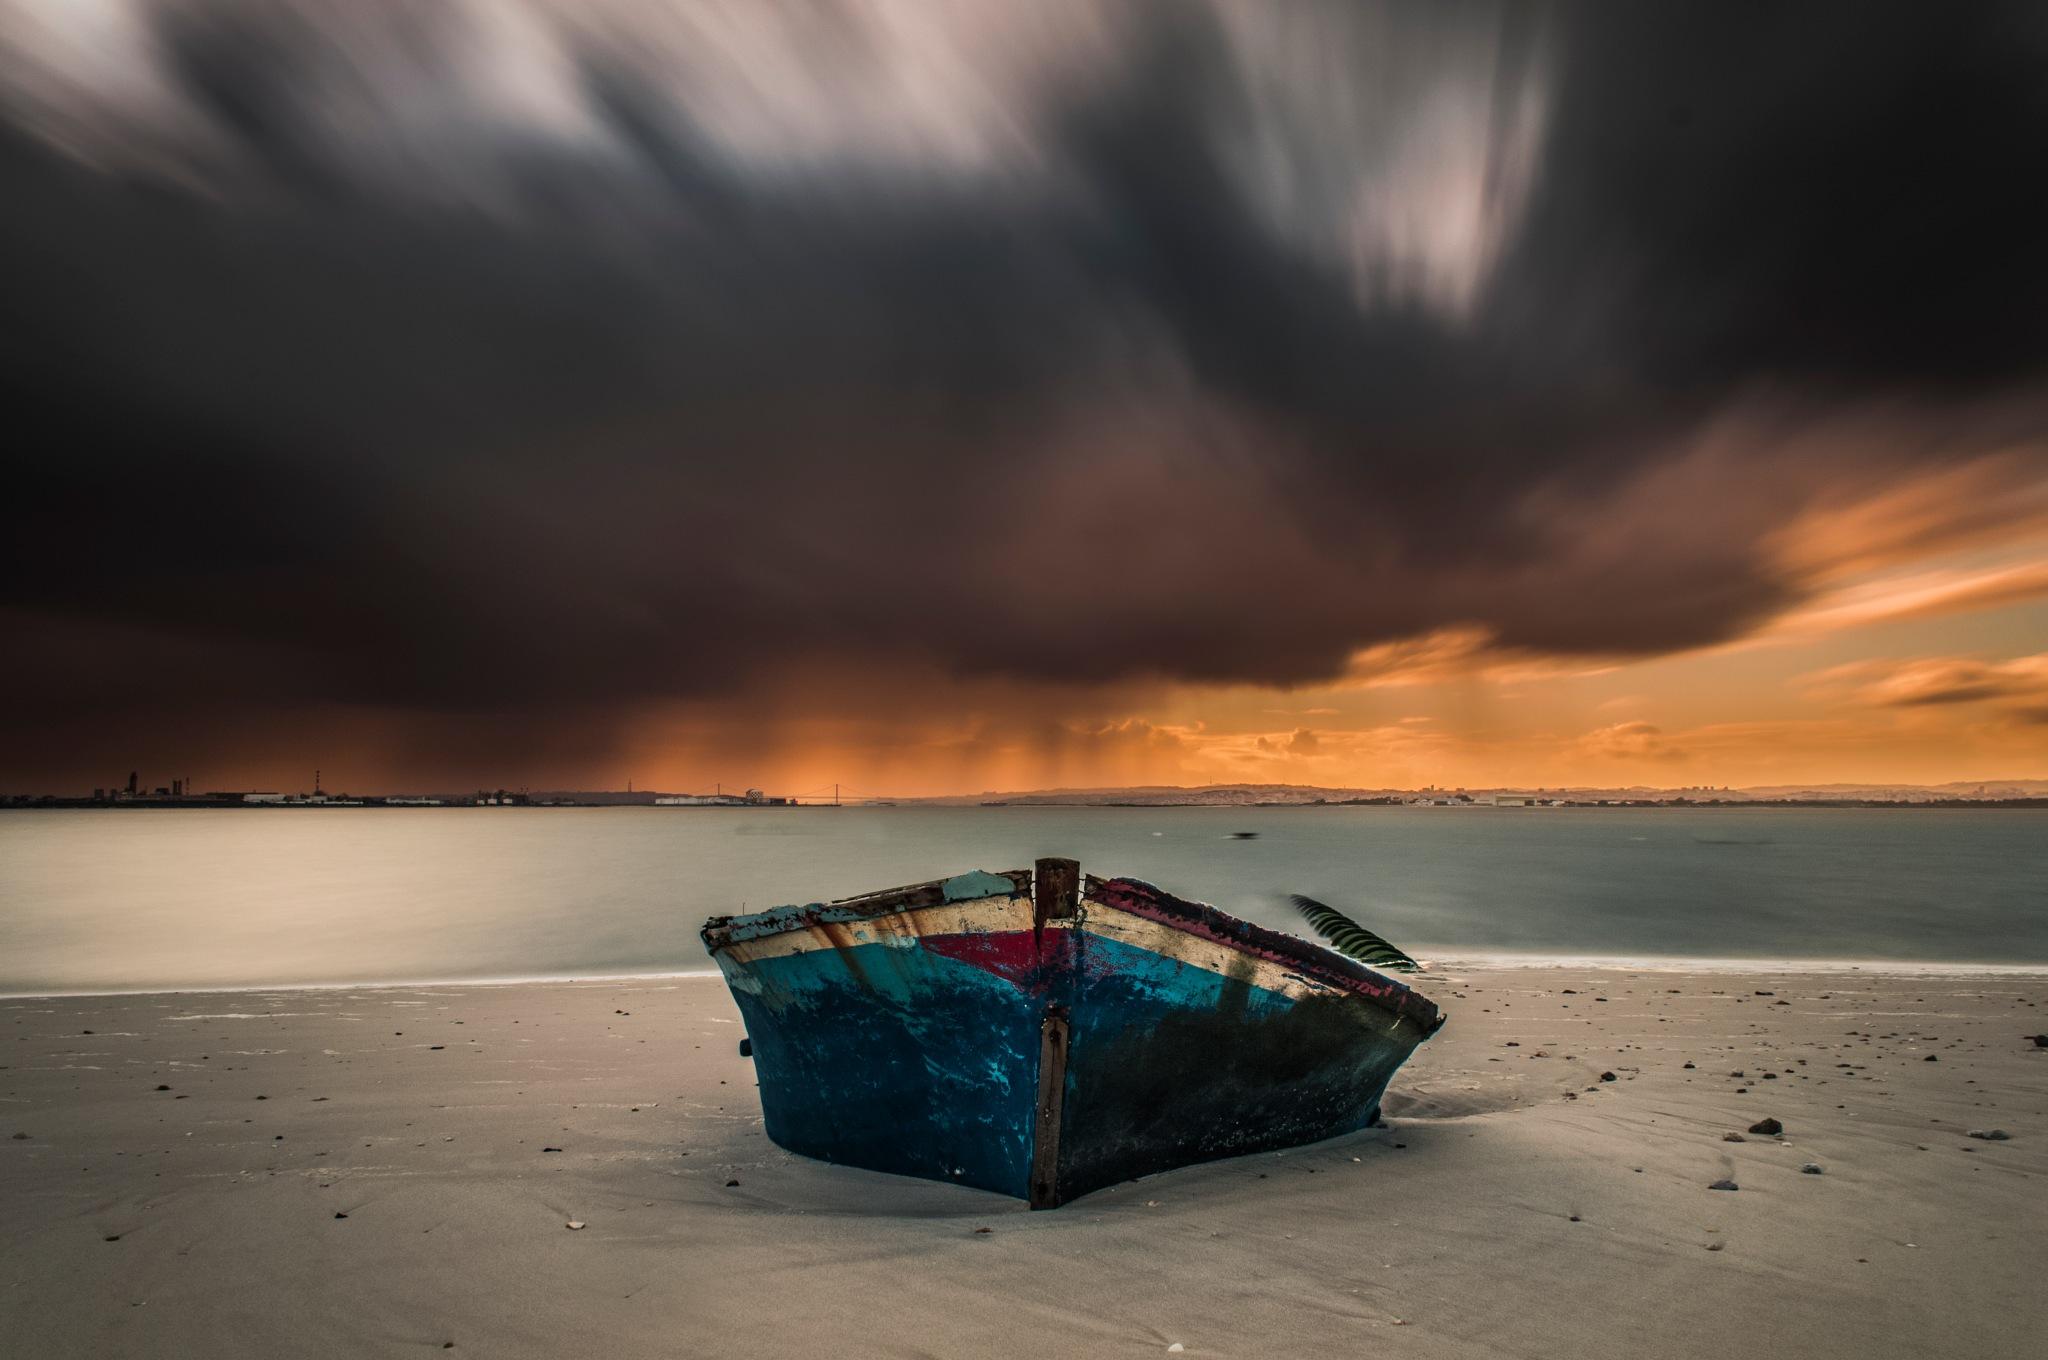 Abandoned by Daniel Boavida